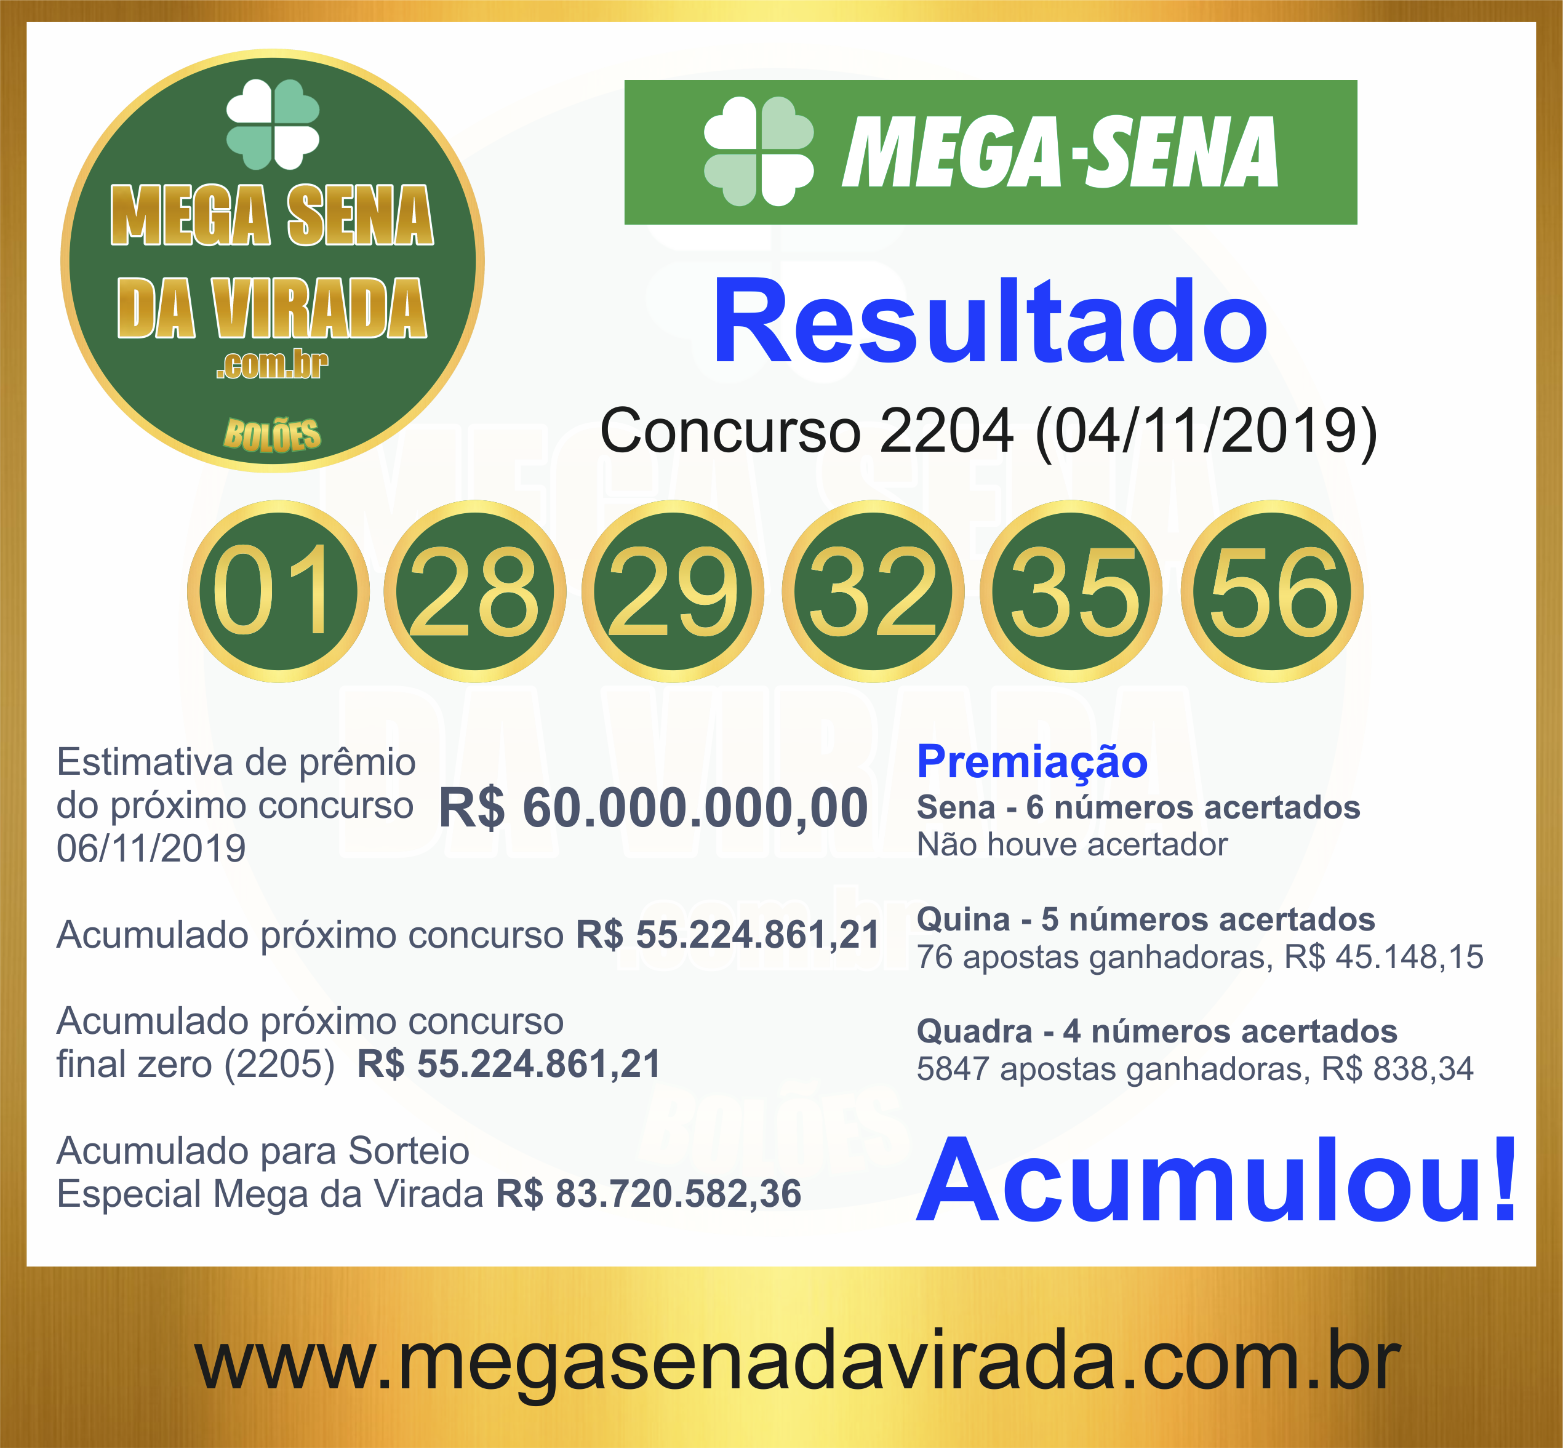 Mega Sena Concurso 2204 04/11/2019